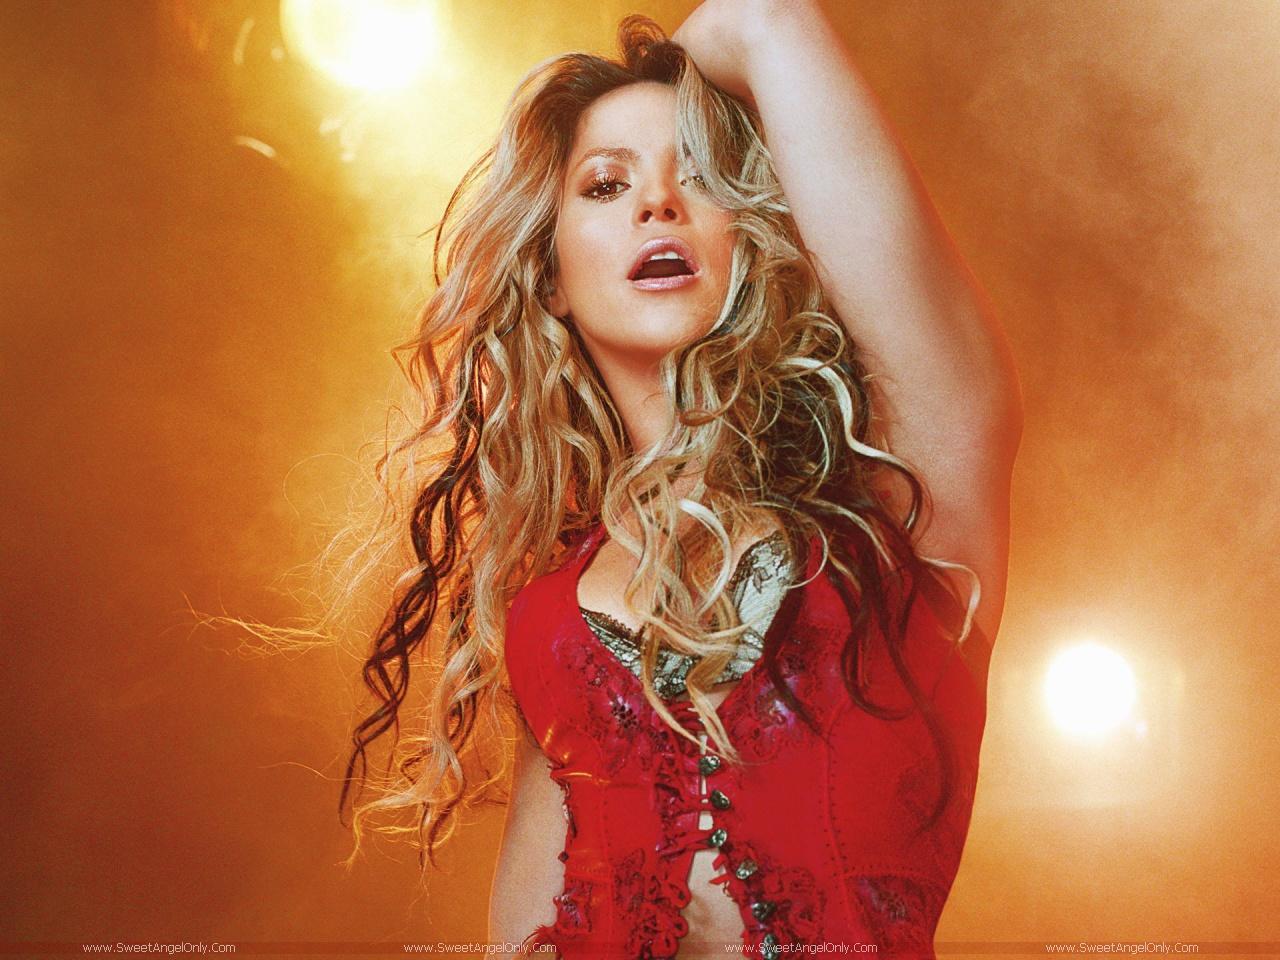 http://1.bp.blogspot.com/-4fTpssV-cis/TmDndNVejHI/AAAAAAAAKKY/1G8TCPjmKA0/s1600/Shakira-hd-wallpaper.jpg